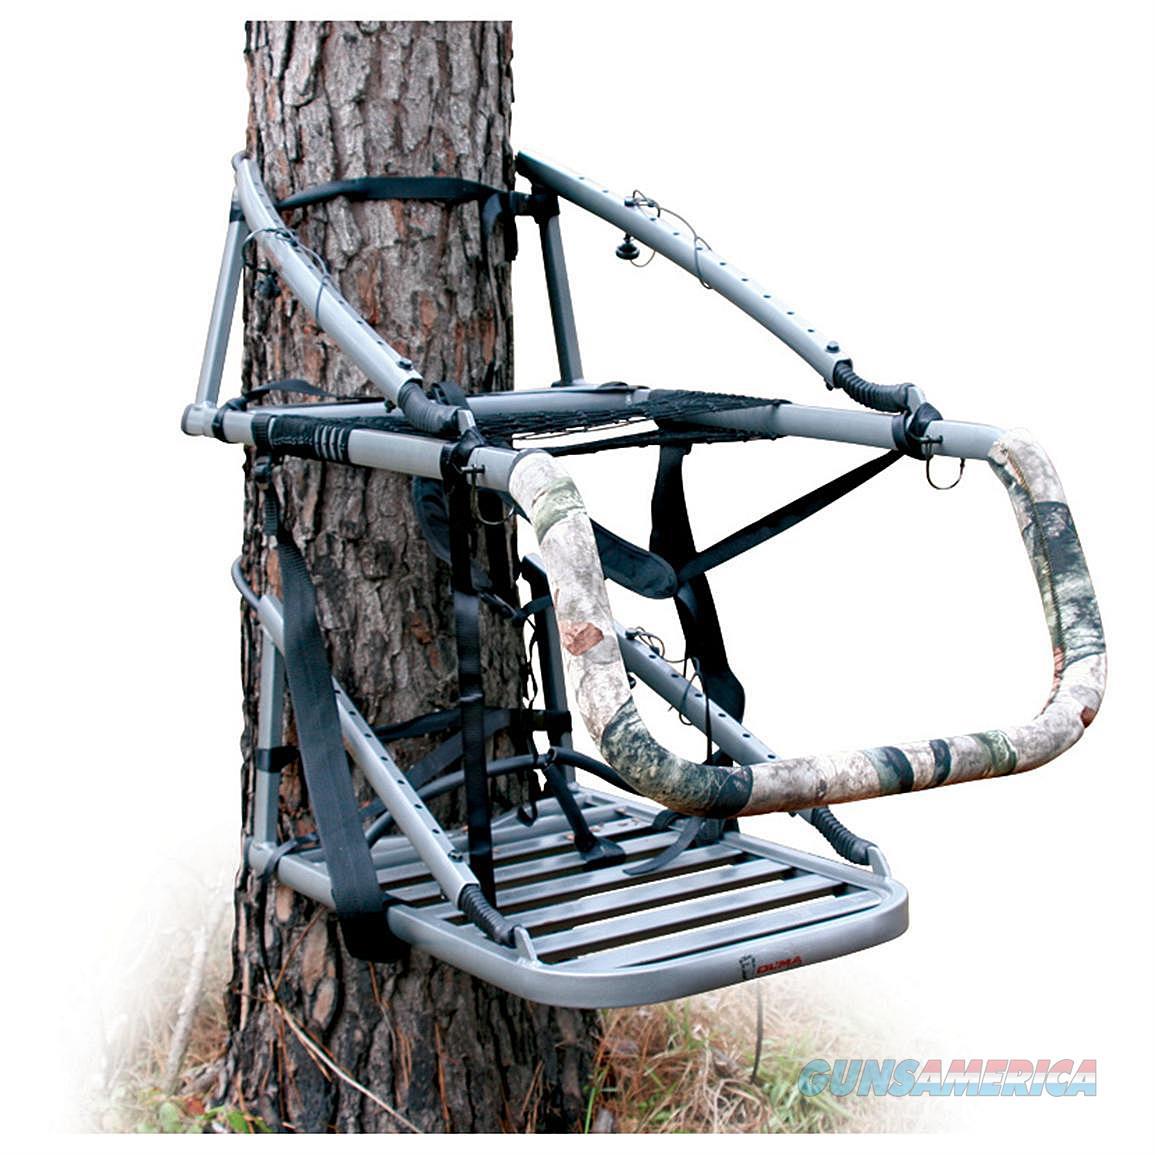 Millennium Ol Man Alumalite Cts Climber   Com-13 COM-13  Non-Guns > Hunting Clothing and Equipment > Tree Stands